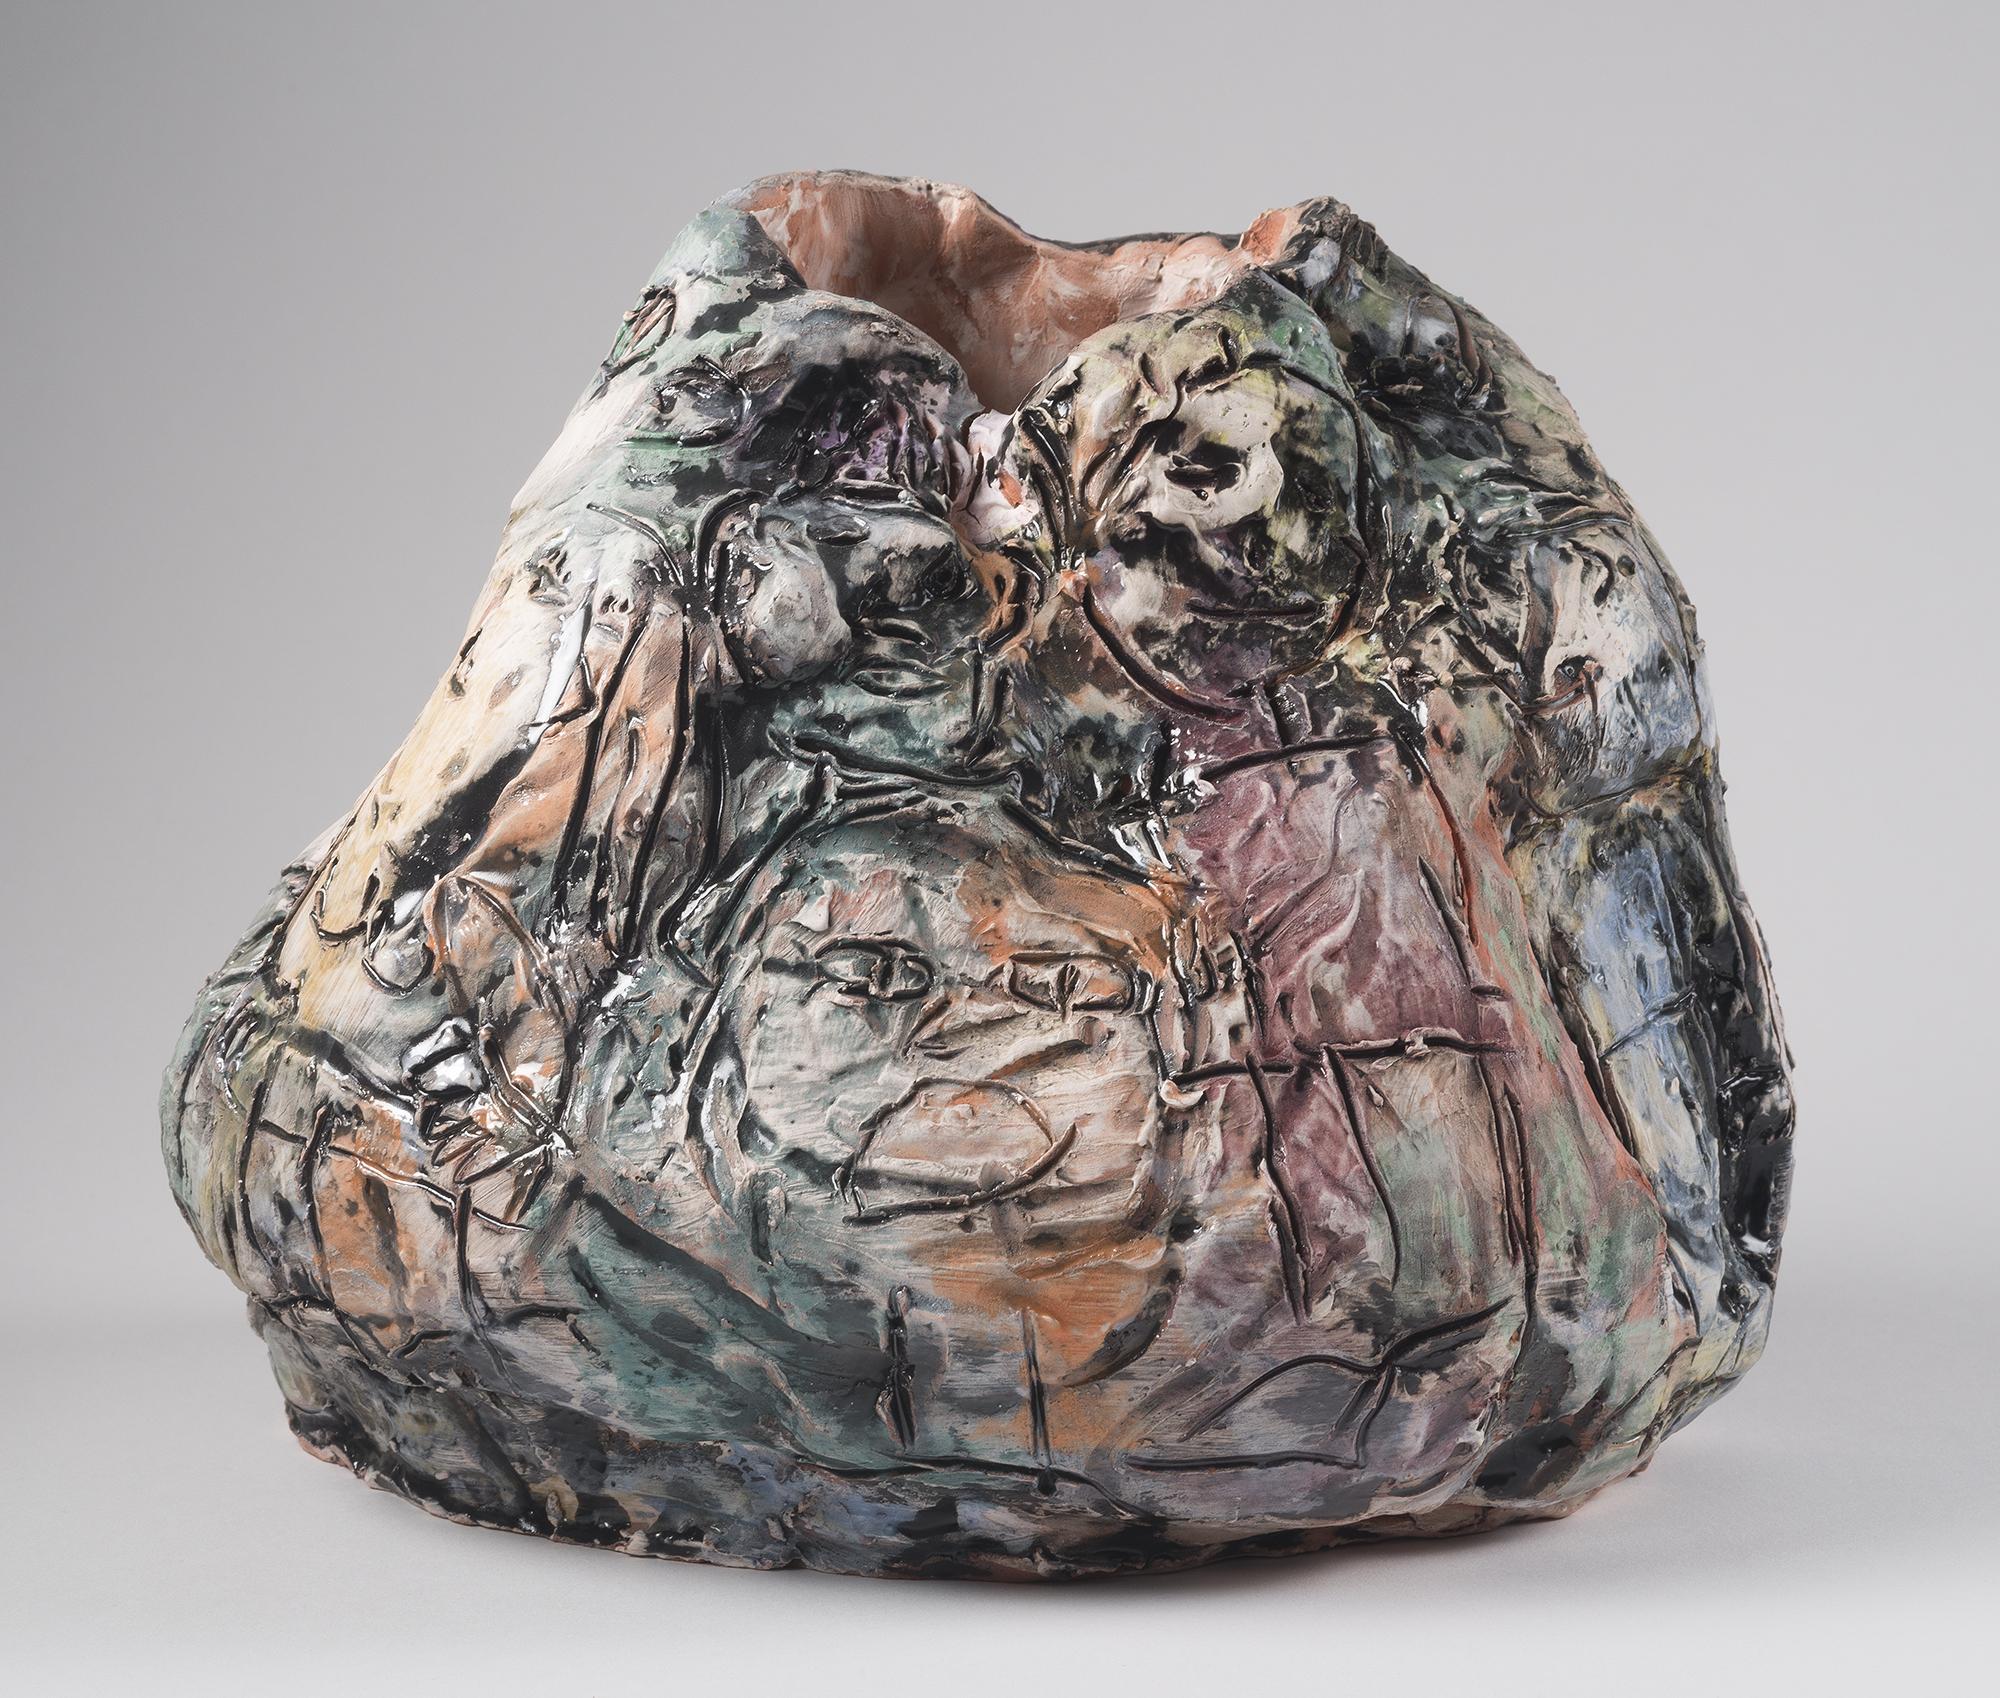 Bag O' Goodies and Baddies (view 2)